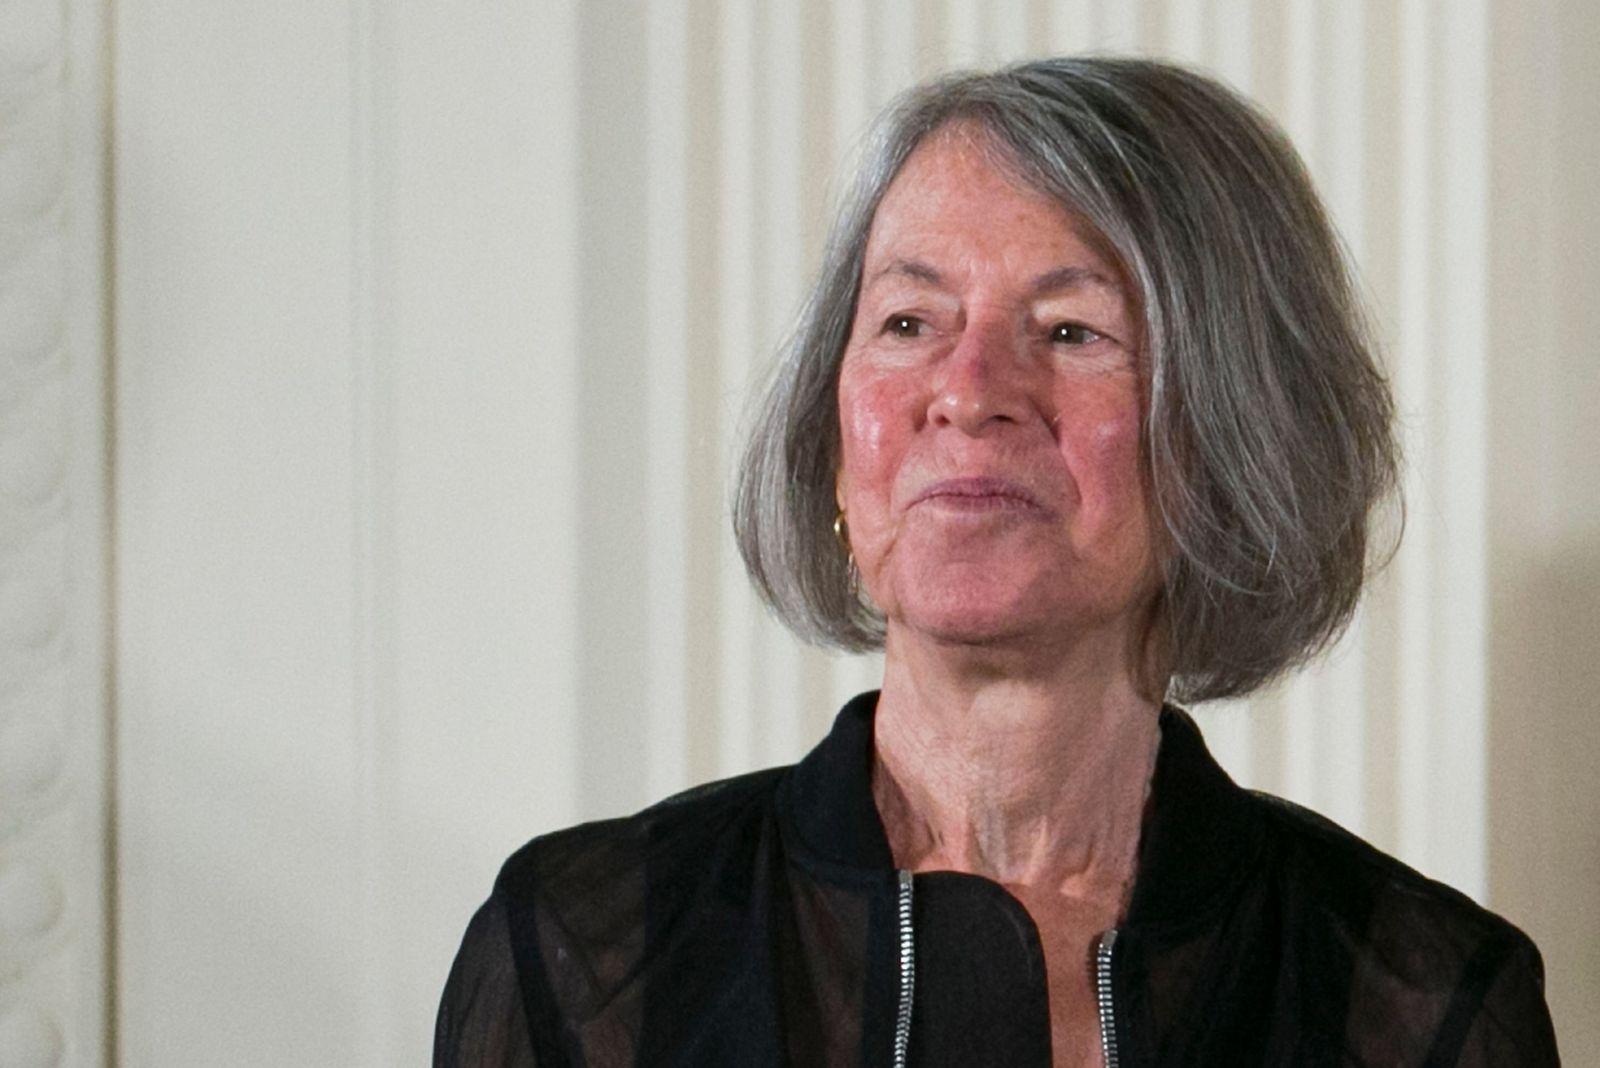 Louise Glueck wins 2020 Nobel Prize in Literature, Washington, USA - 22 Sep 2016